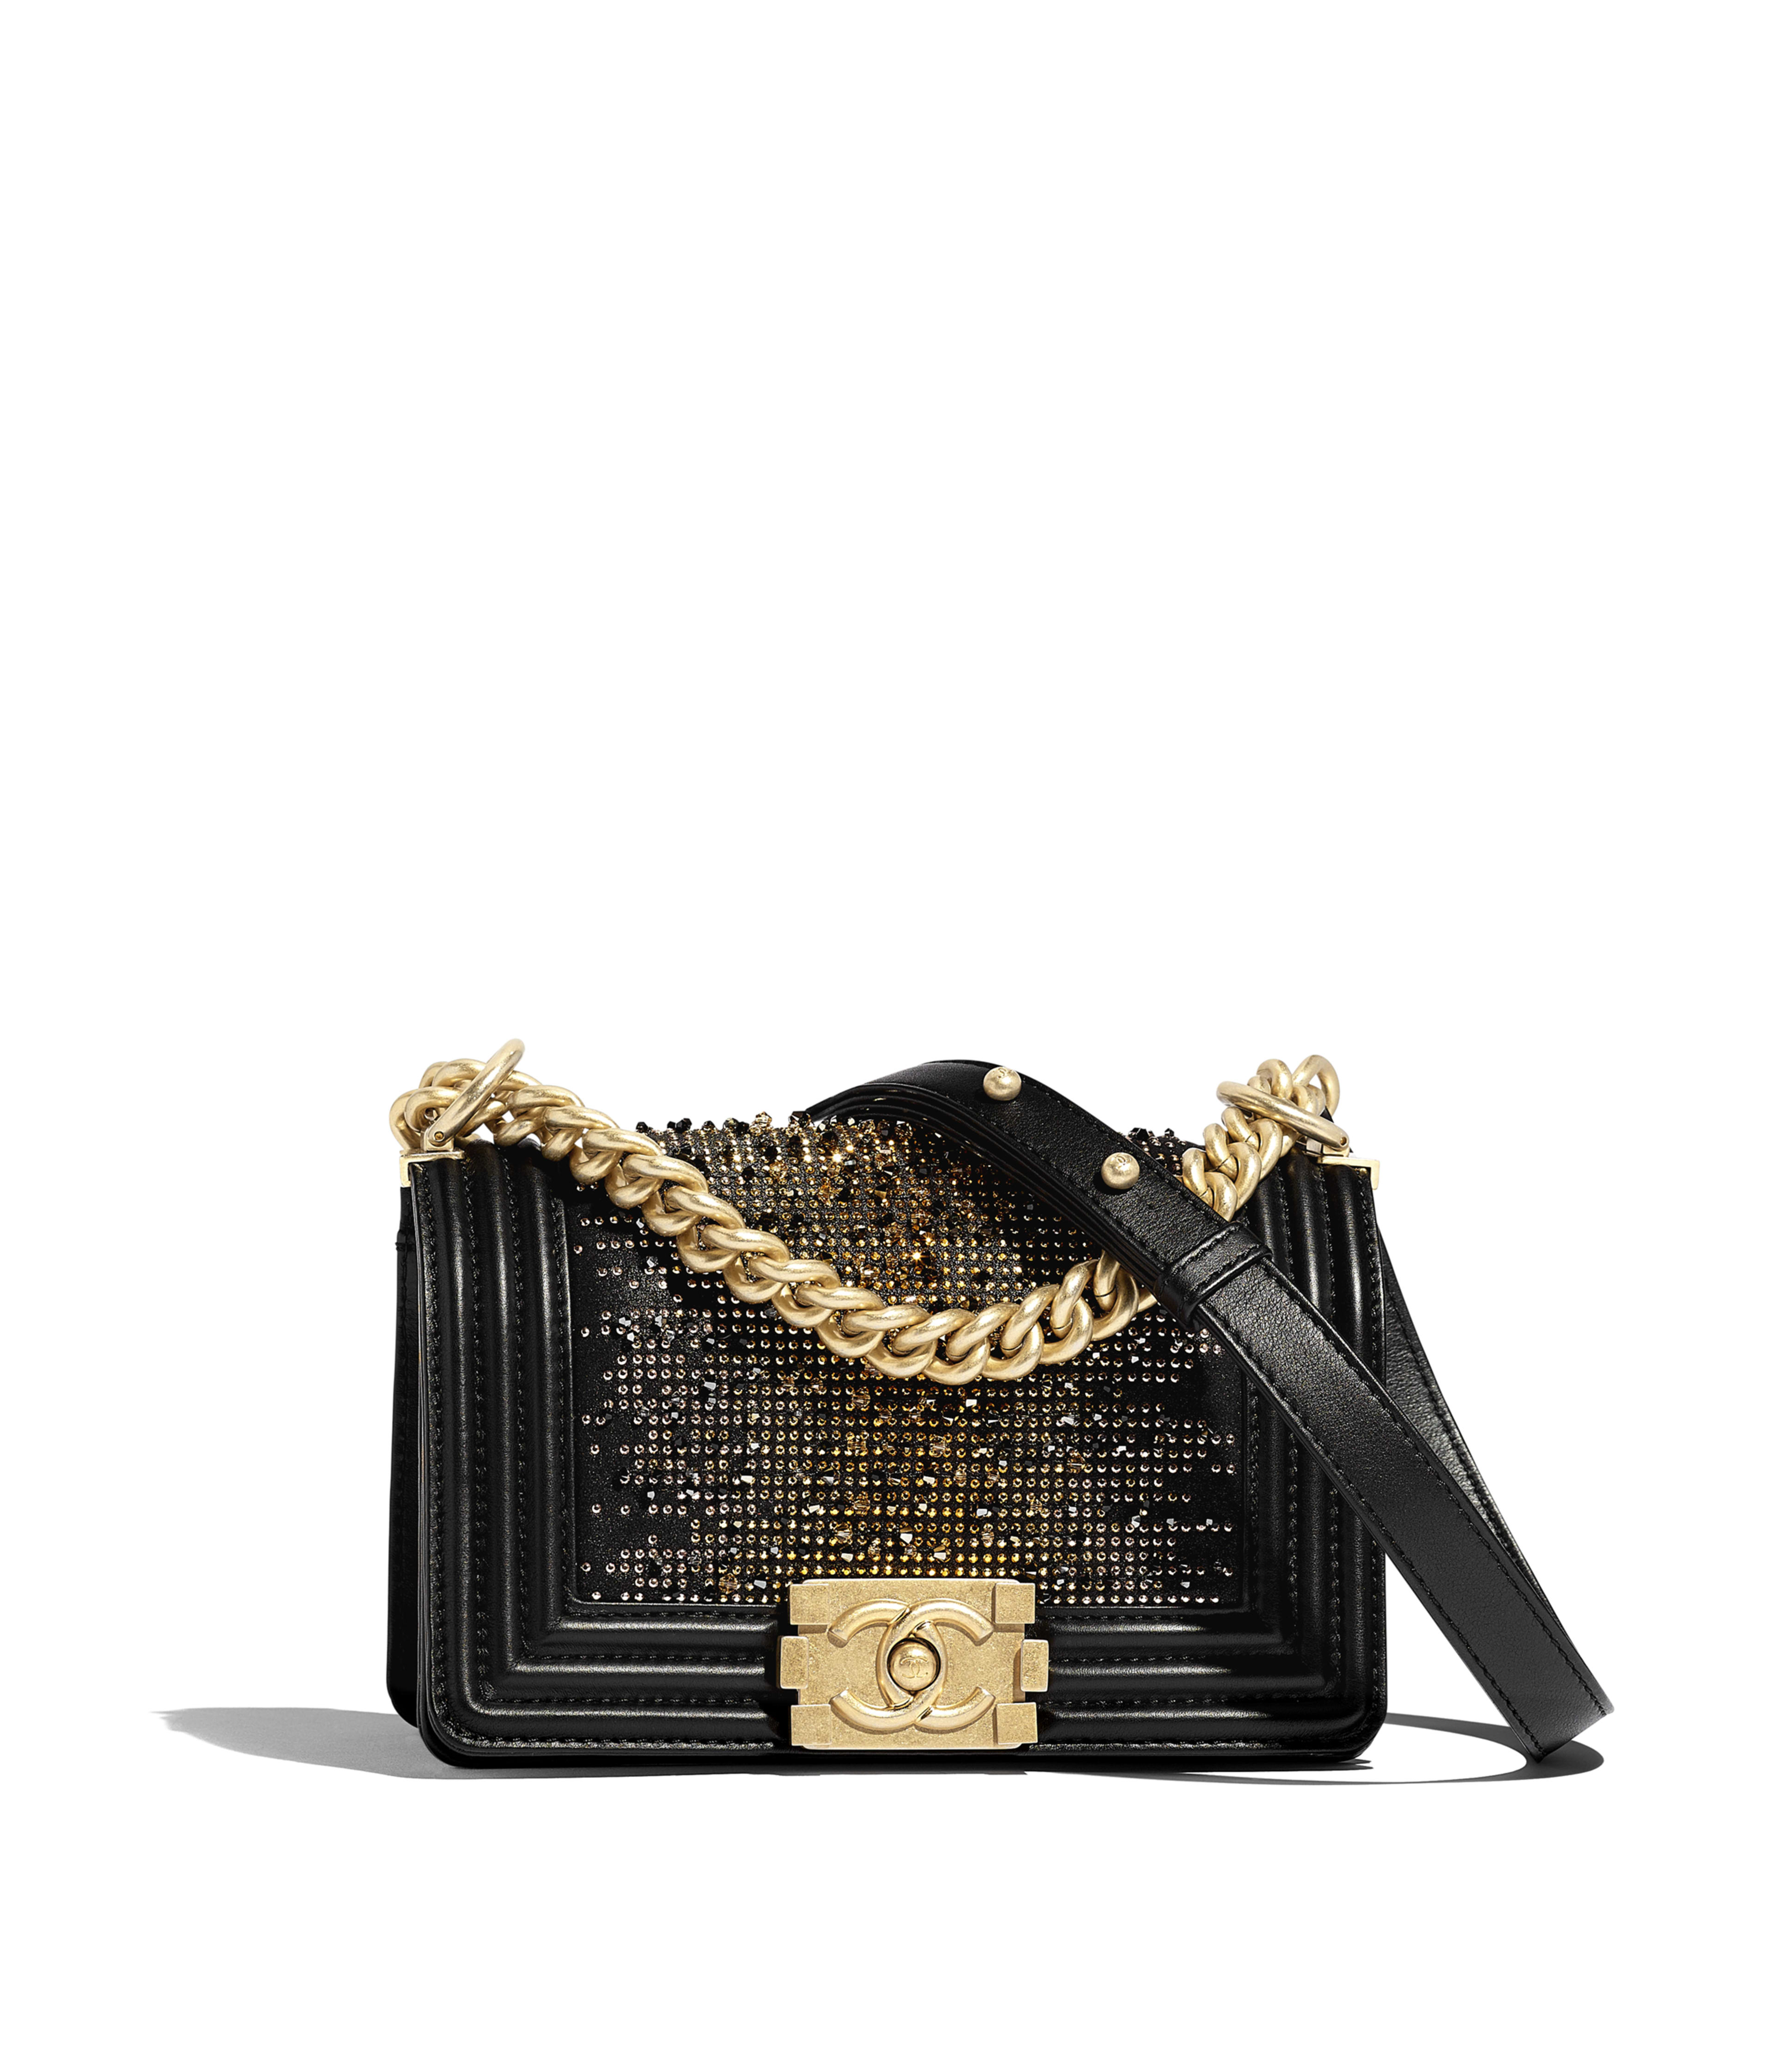 231add16802b Small BOY CHANEL Handbag Calfskin, Strass & Gold-Tone Metal, Black Ref.  A67085B0077794305